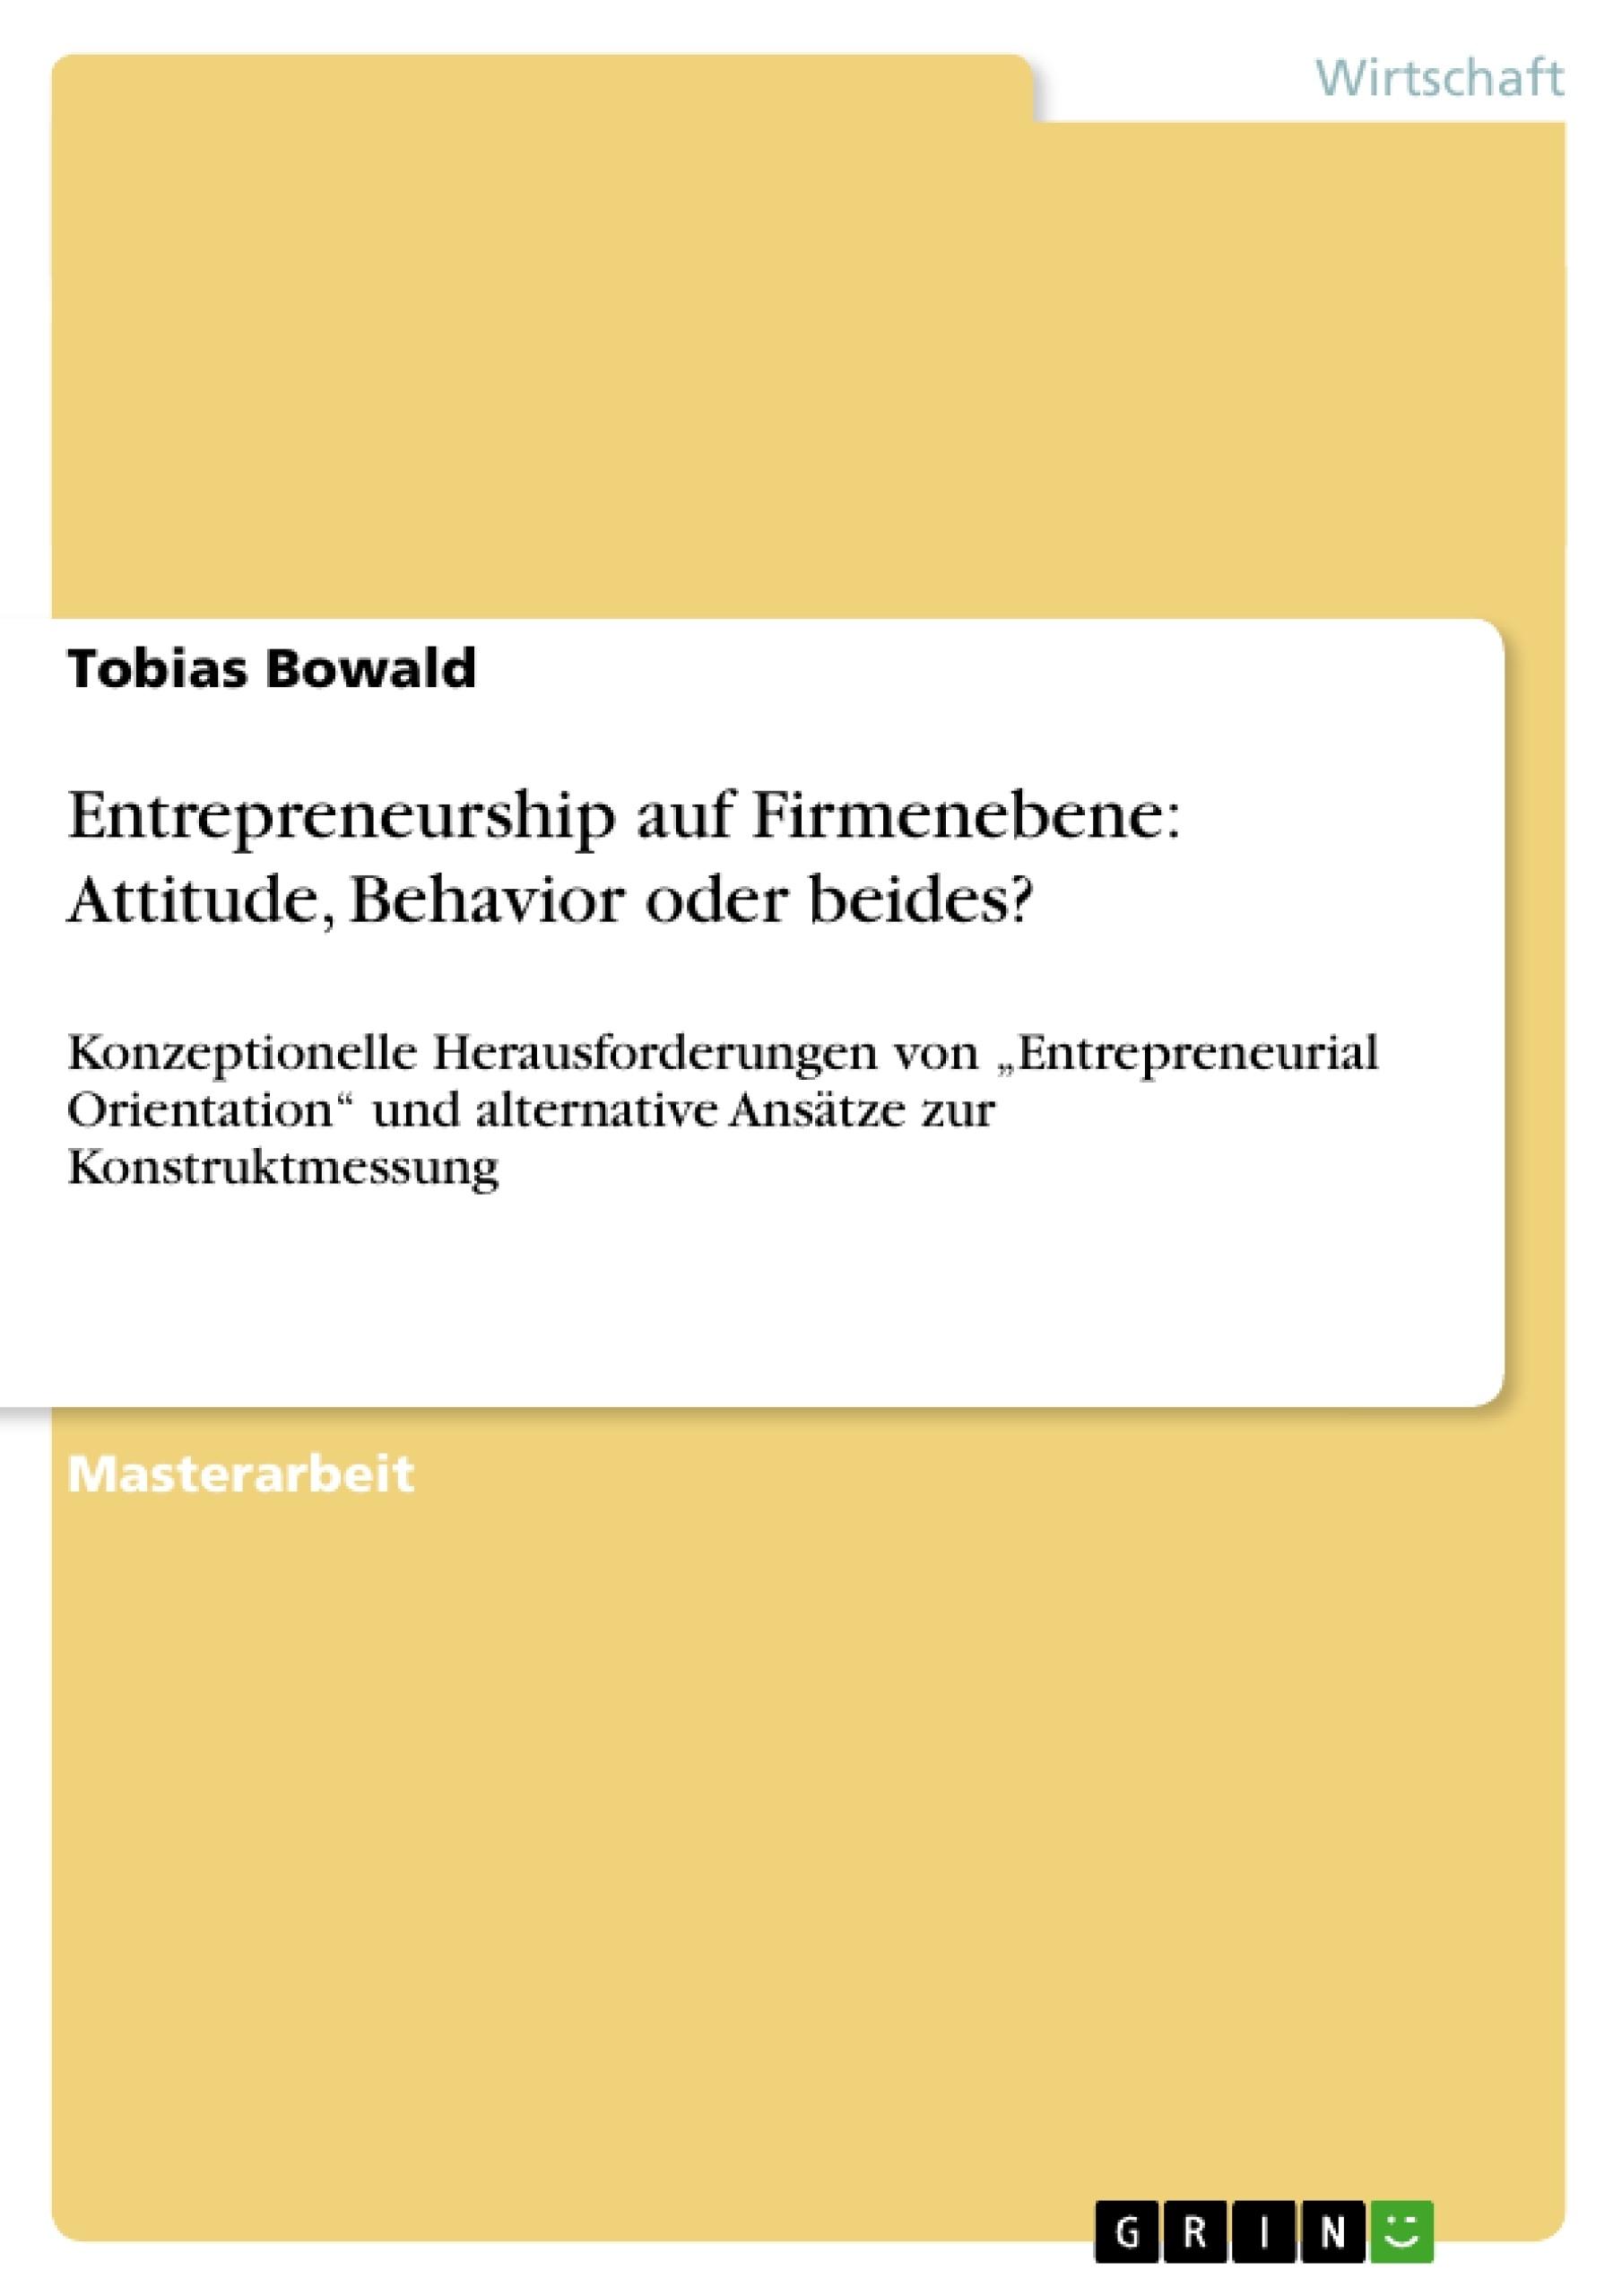 Titel: Entrepreneurship auf Firmenebene: Attitude, Behavior oder beides?